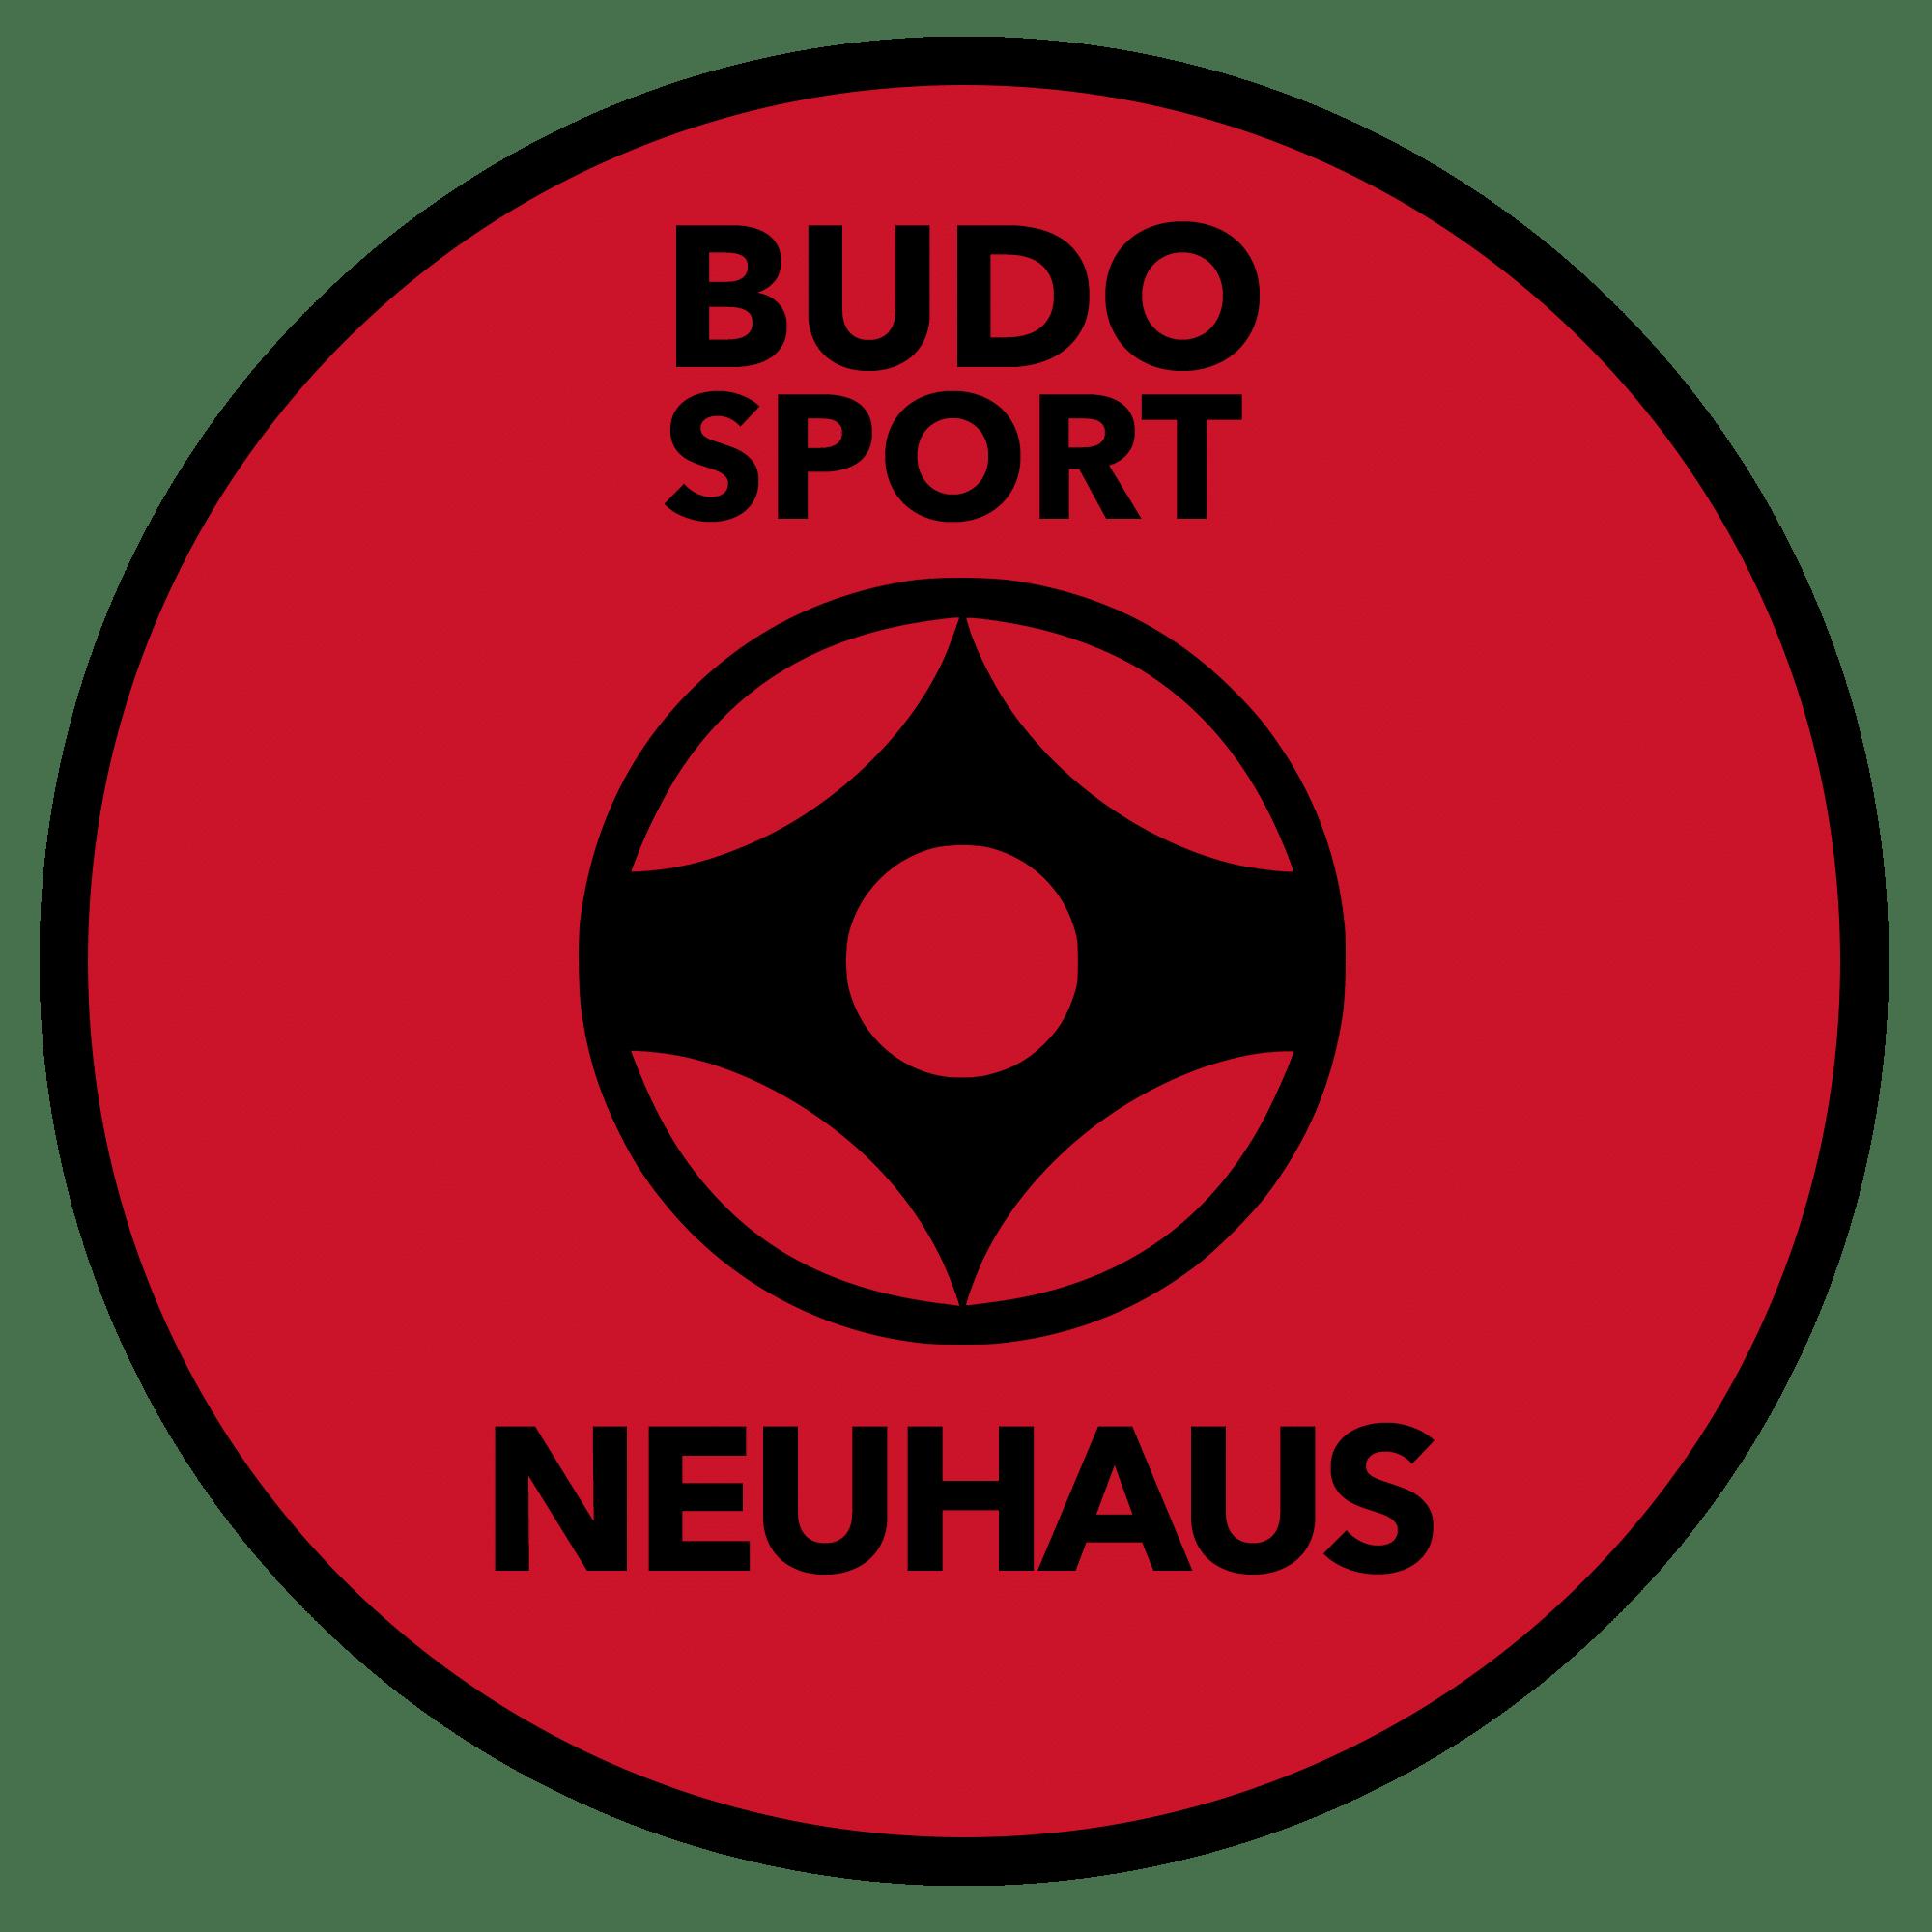 Logo Budosport Neuhaus transparant